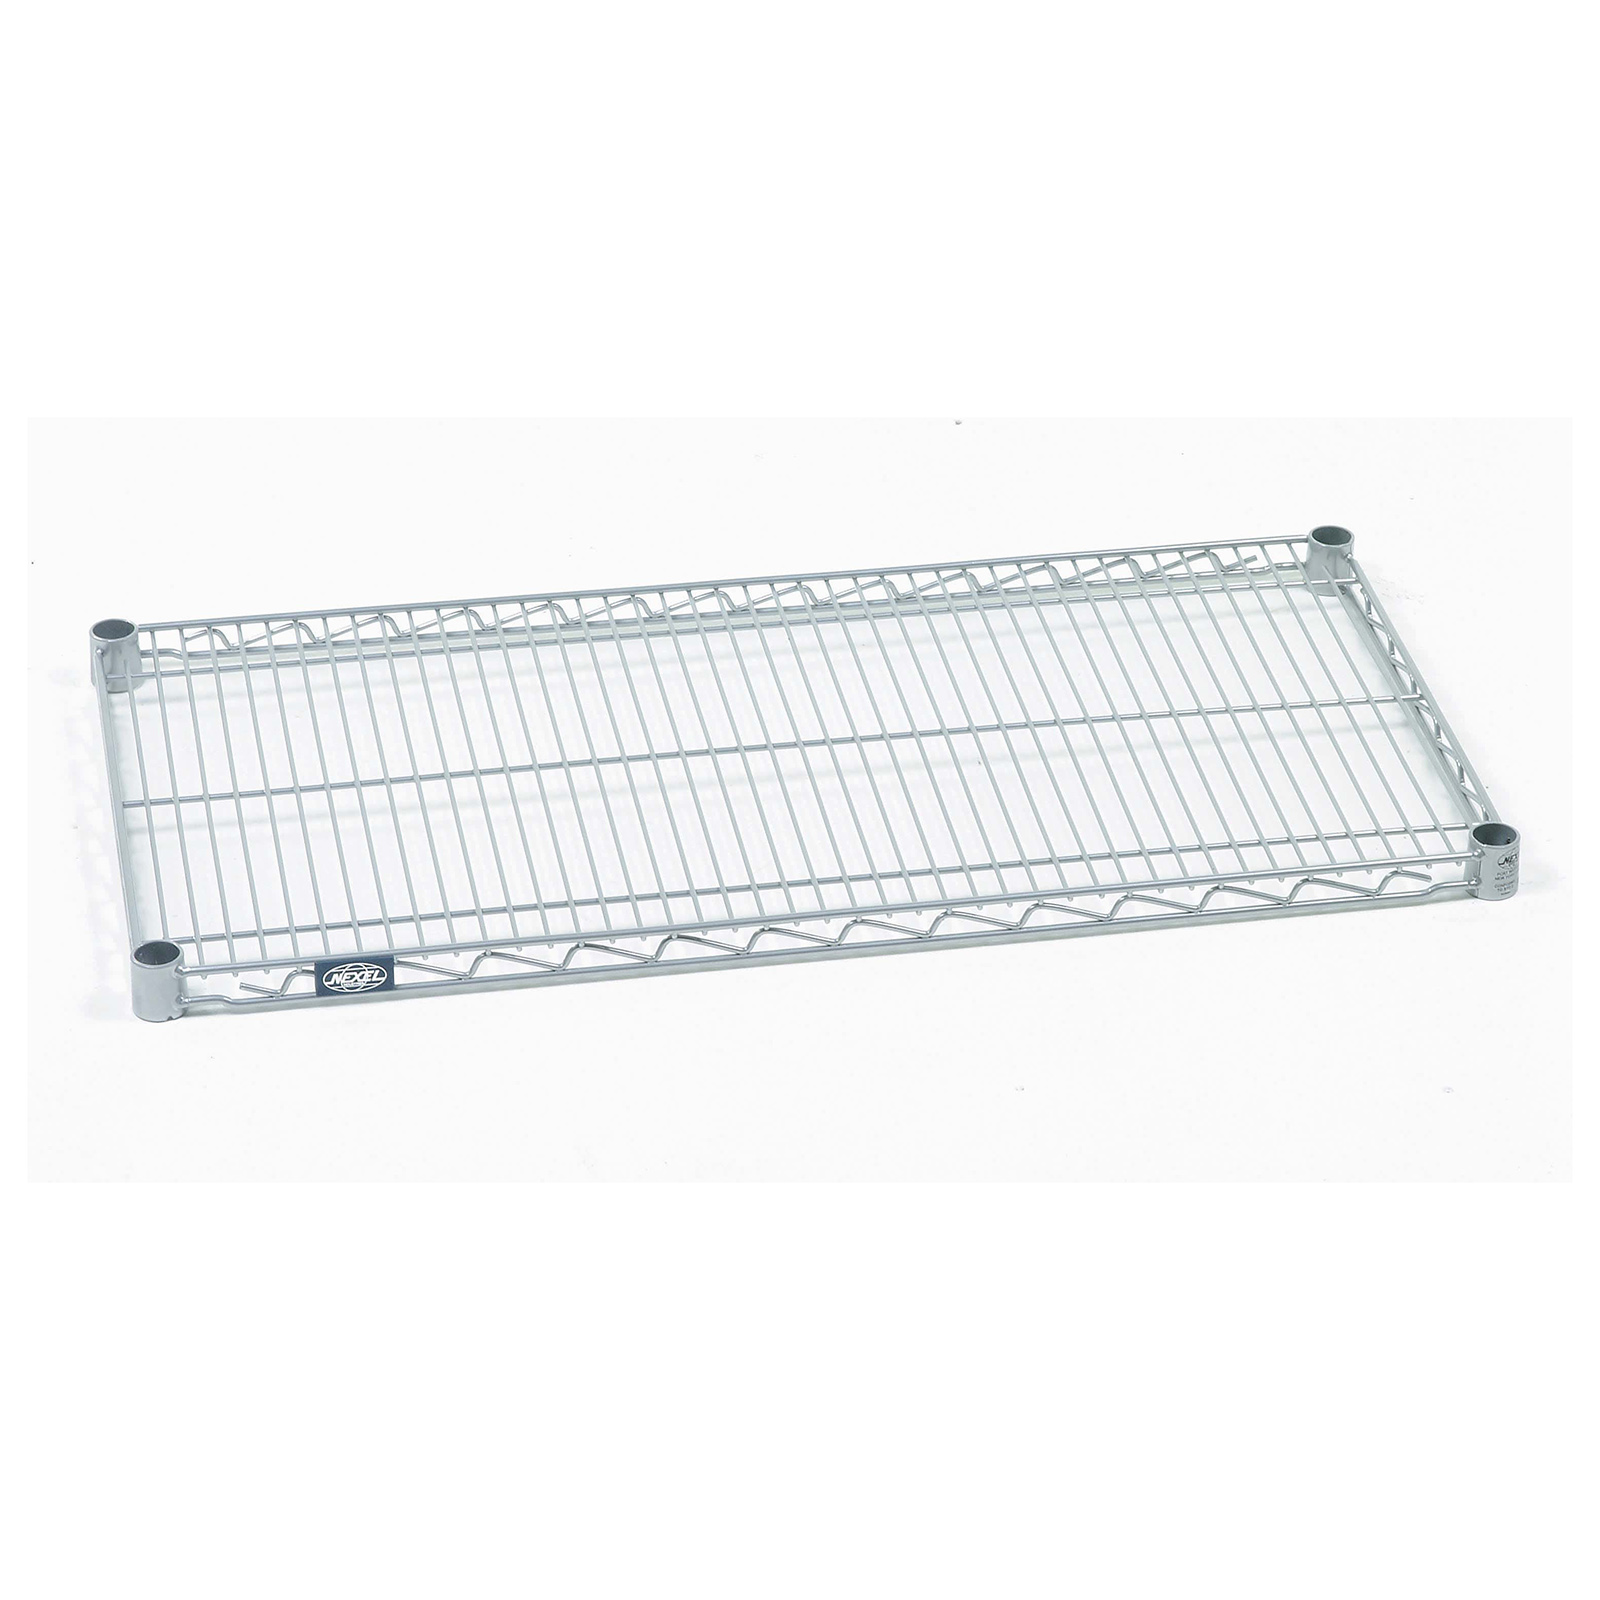 NEXEL S2454EP shelving, wire